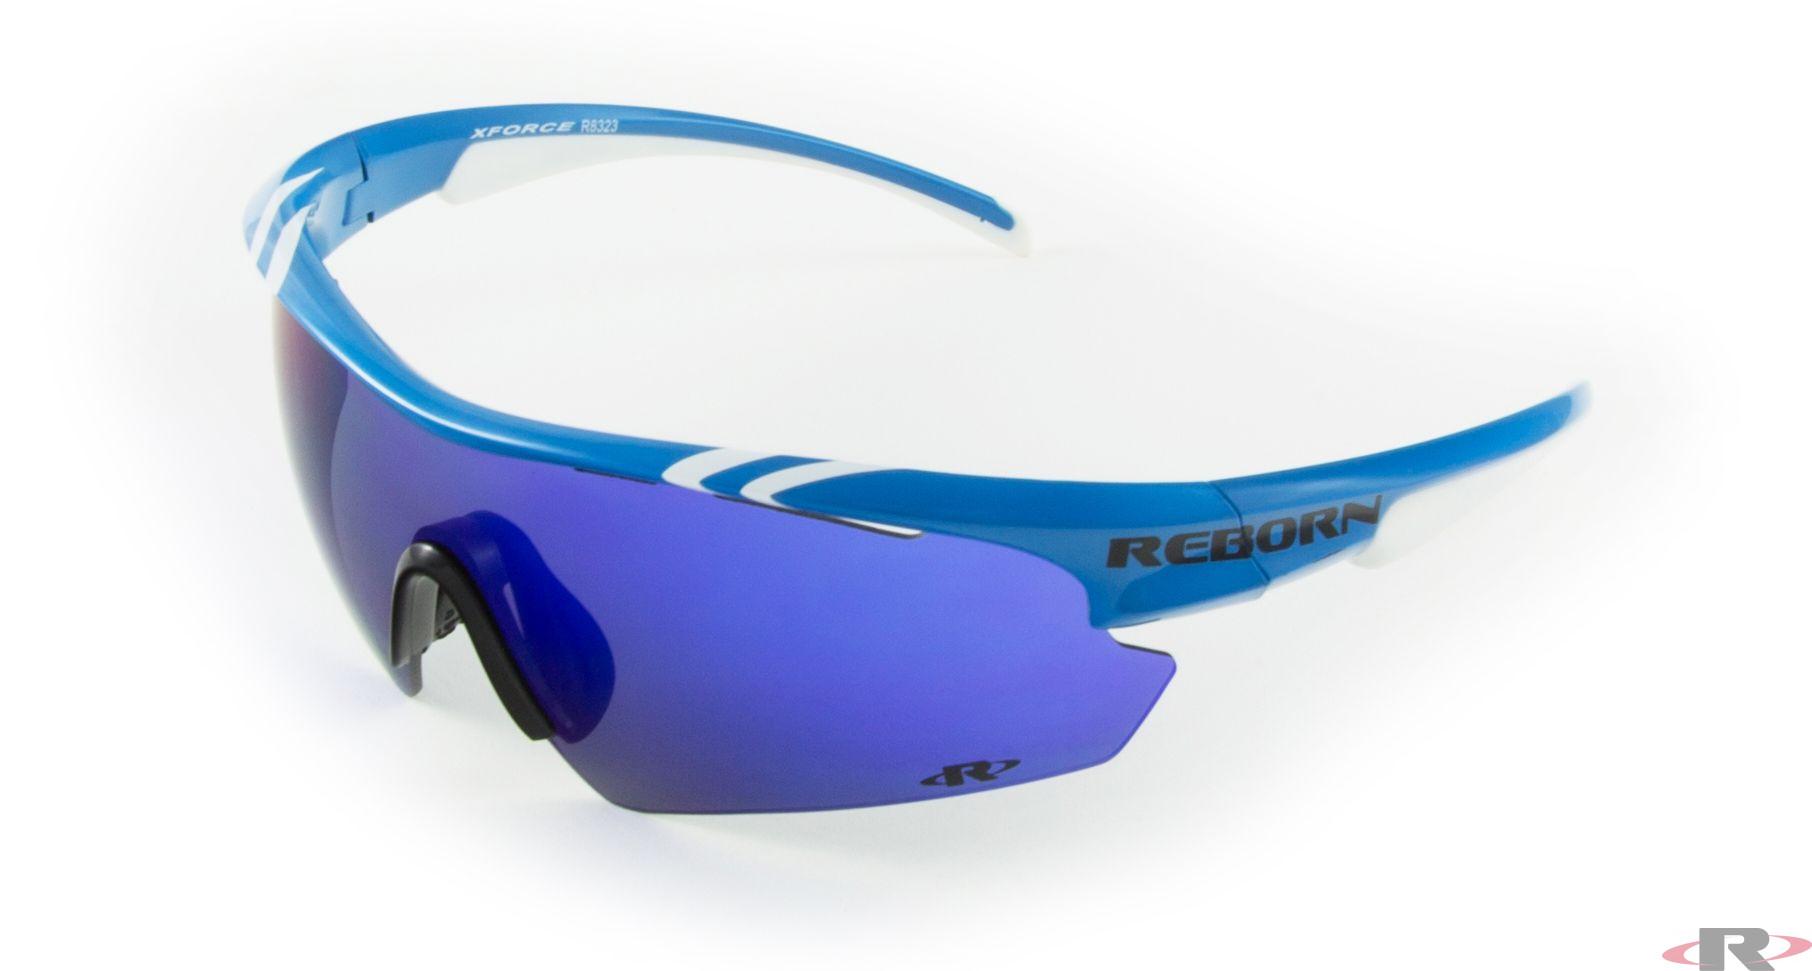 X-PRO blau-weiss / revo blau